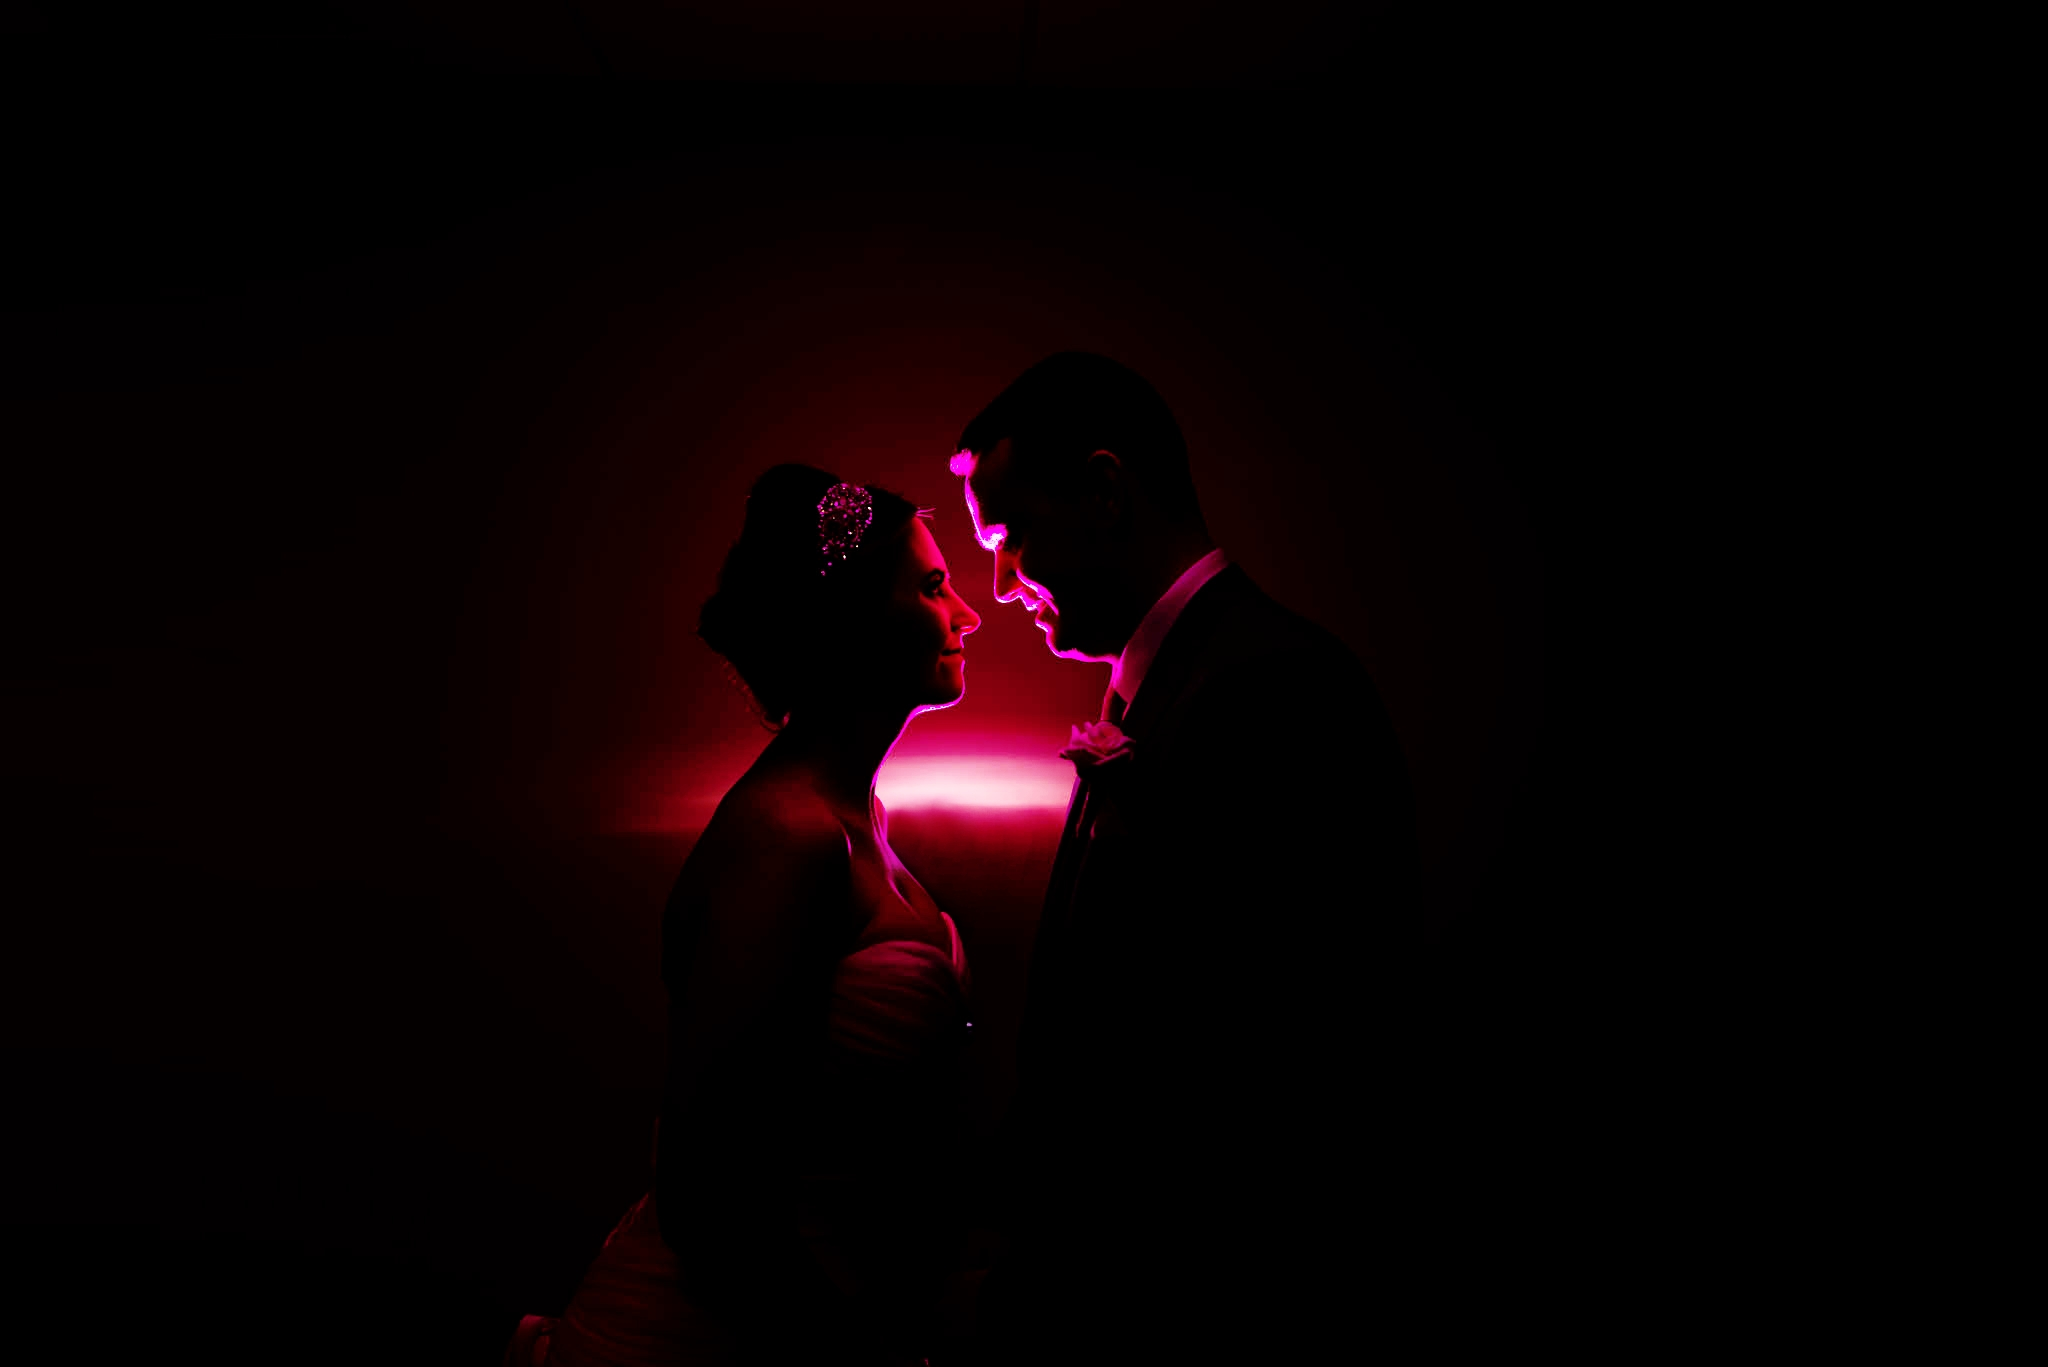 lake vrynwy hotel wedding photographer, autum winter wedding with dramatic and alternative lighting effects